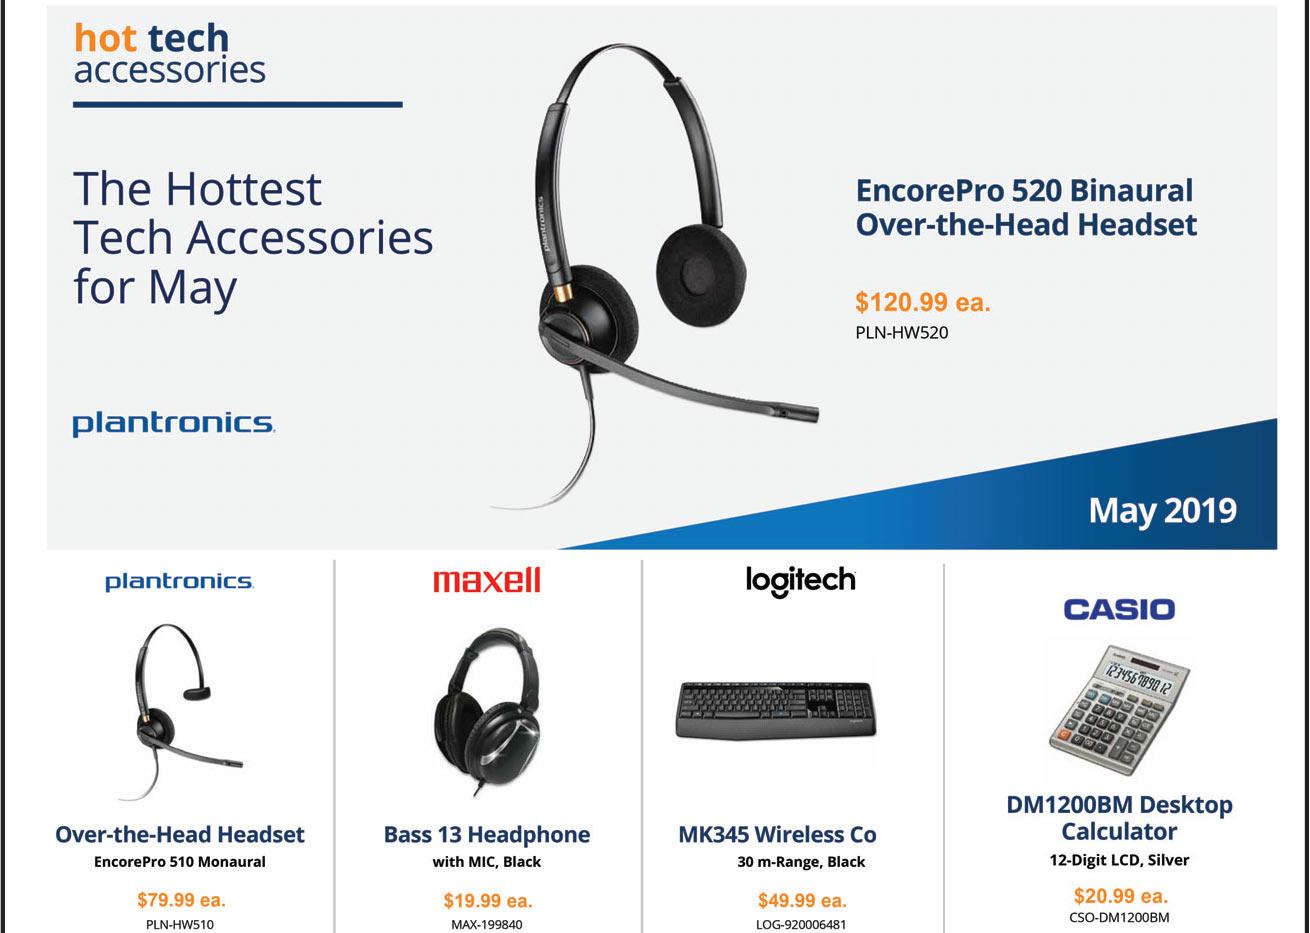 fmi-1048-tech-accessories-may-2019-social